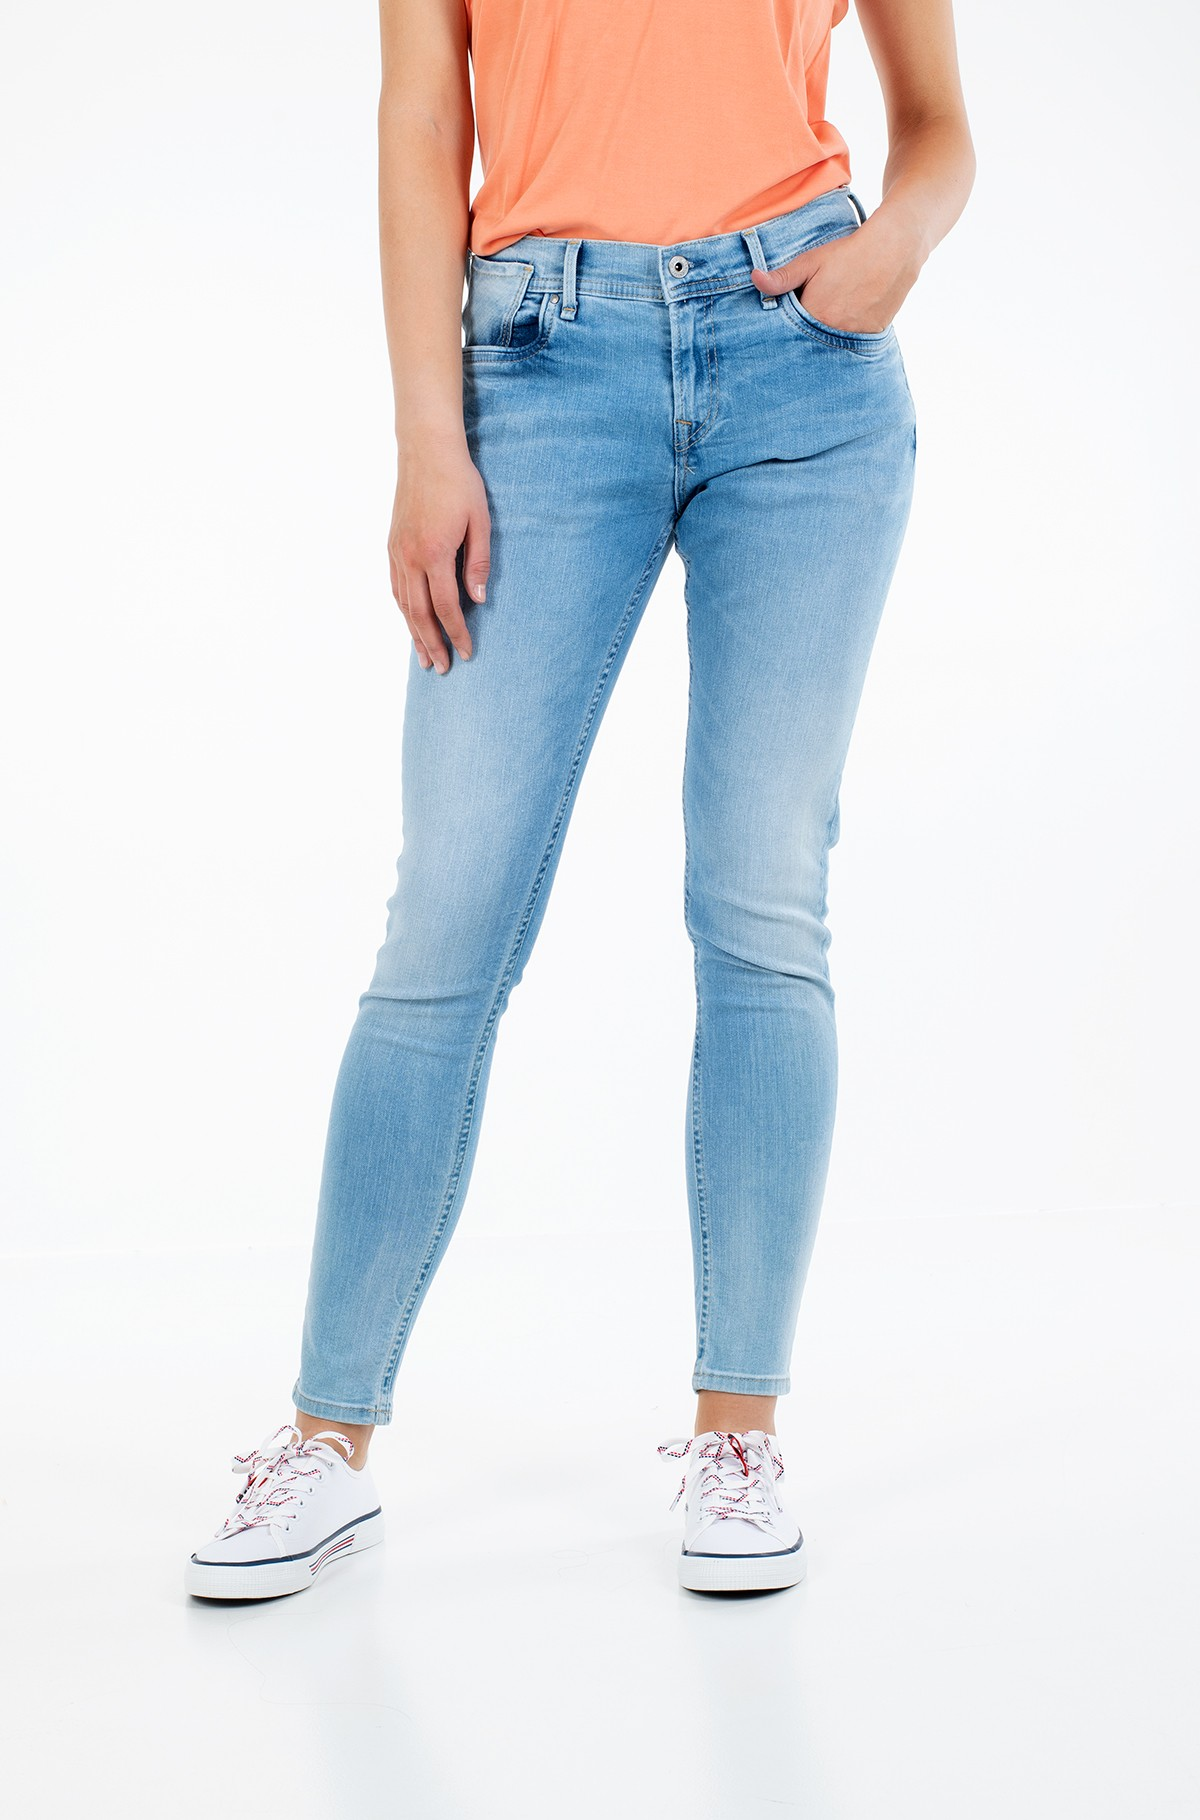 Jeans JOEY/PL201090MF6-full-1